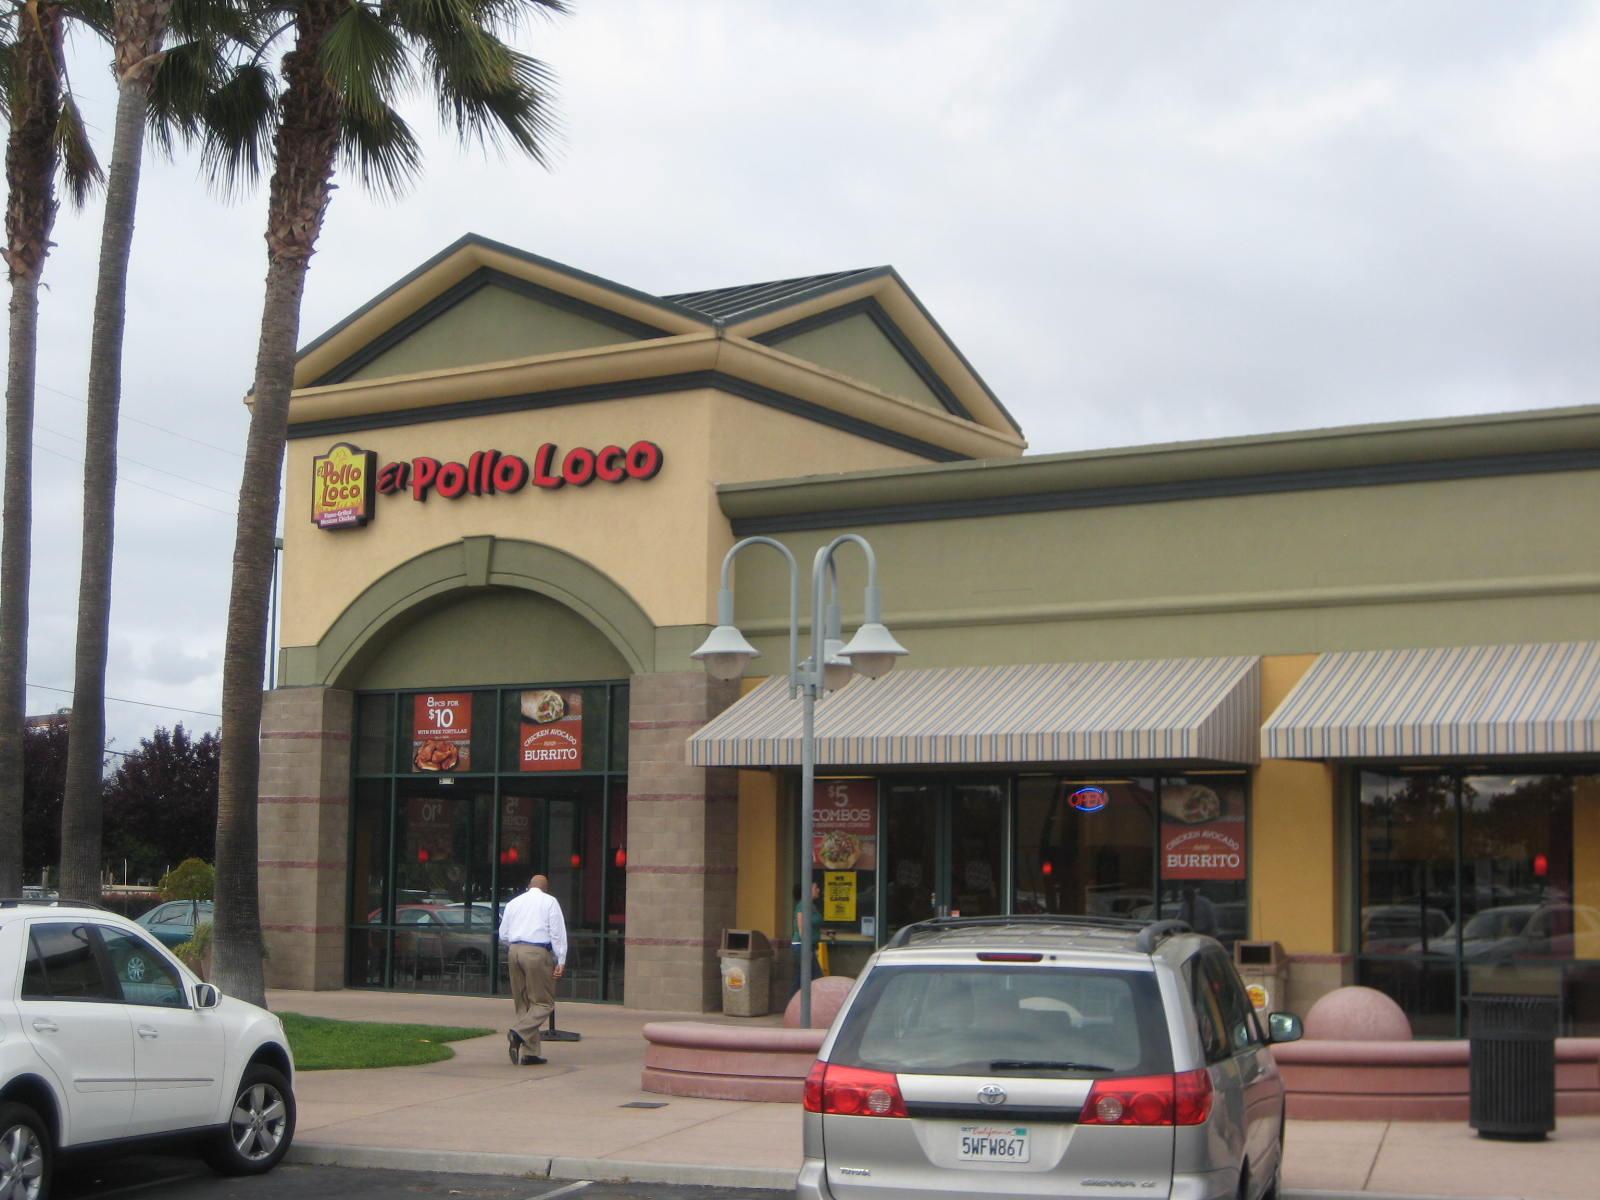 El Pollo Loco - Monterey Rd, Unit 30, San Jose, California - Rated based on 41 Reviews